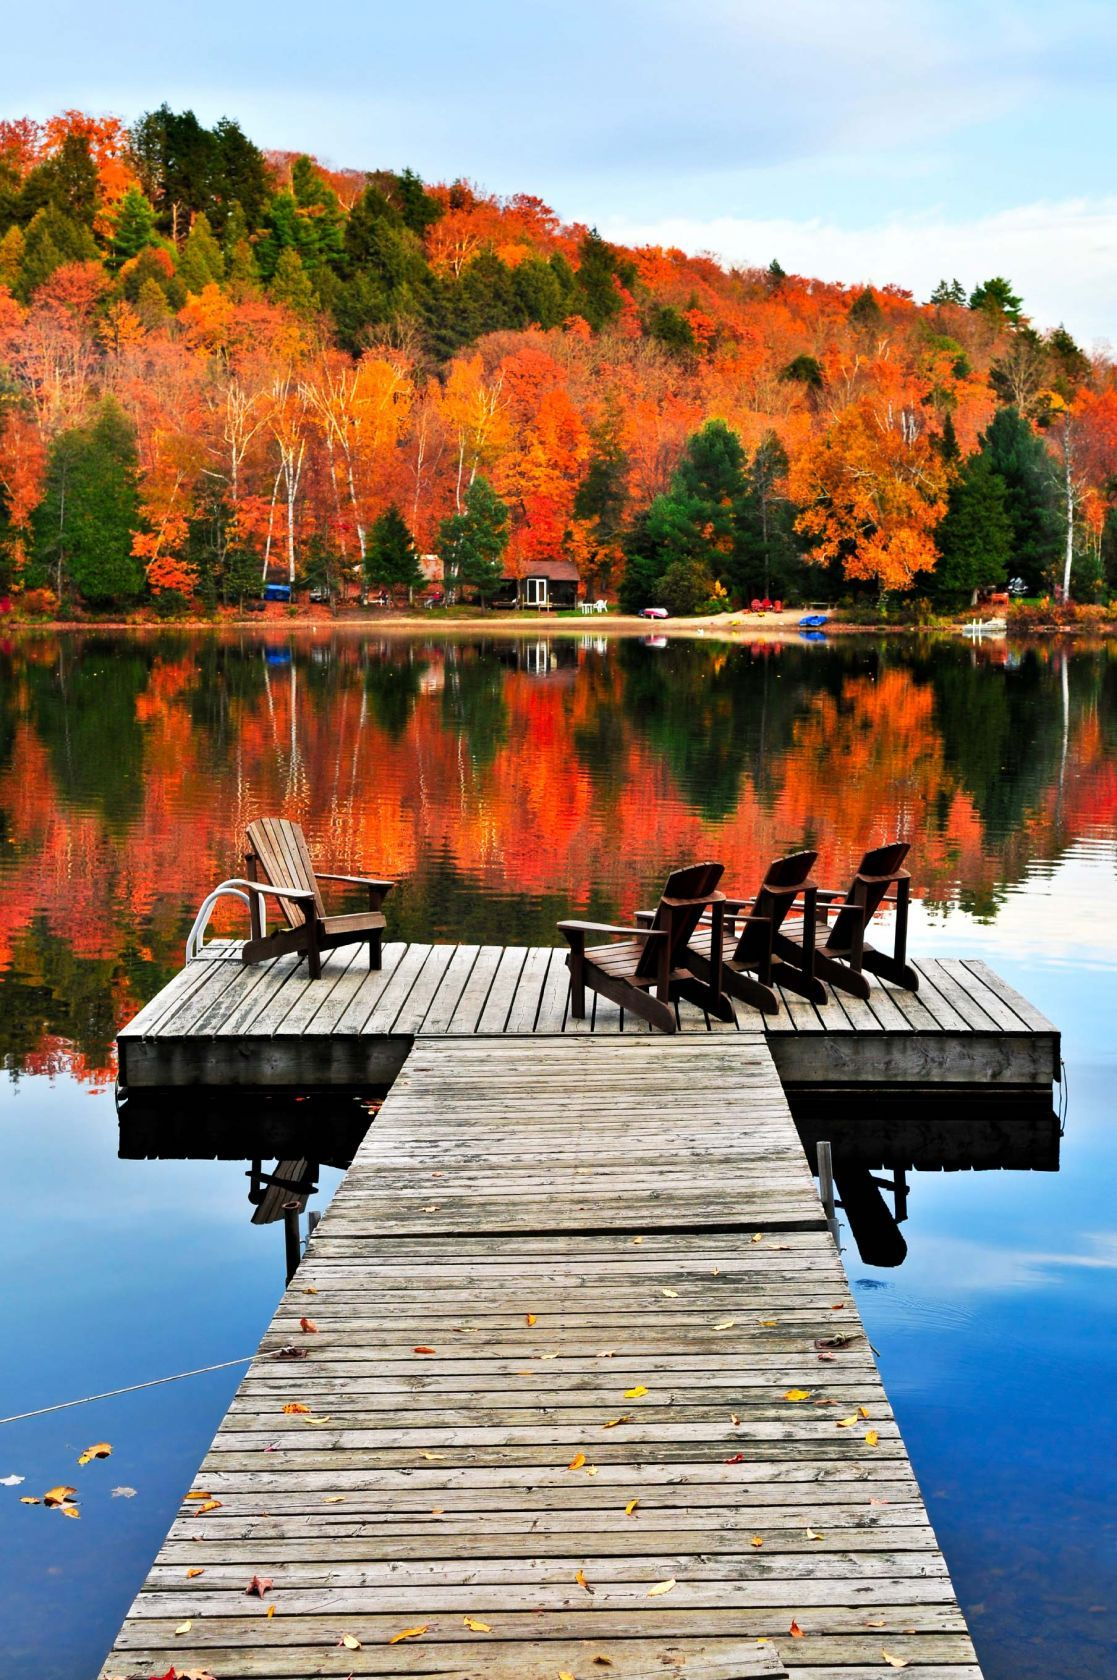 Algonquin Park, Ontario, Canada #atlasformen #atlasformende #atlasformendeutschland #meinung #winter #trekking #canada #kanada